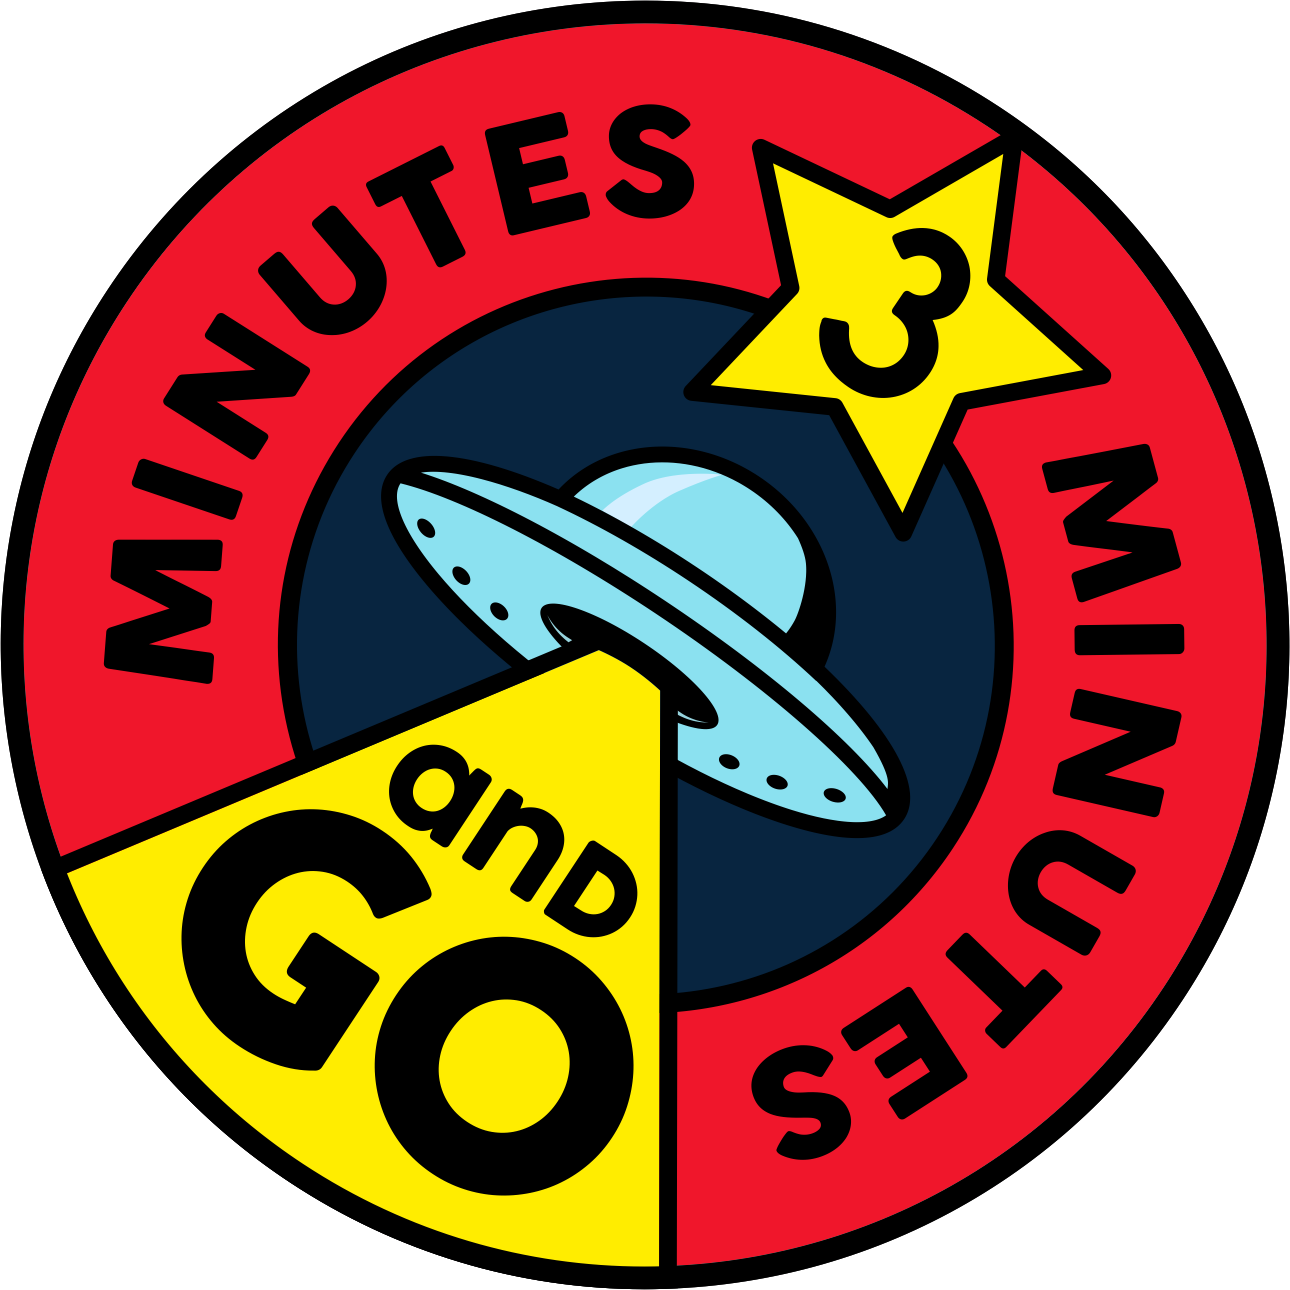 3min&Go Delivery Доставка пиццы за 29 минут